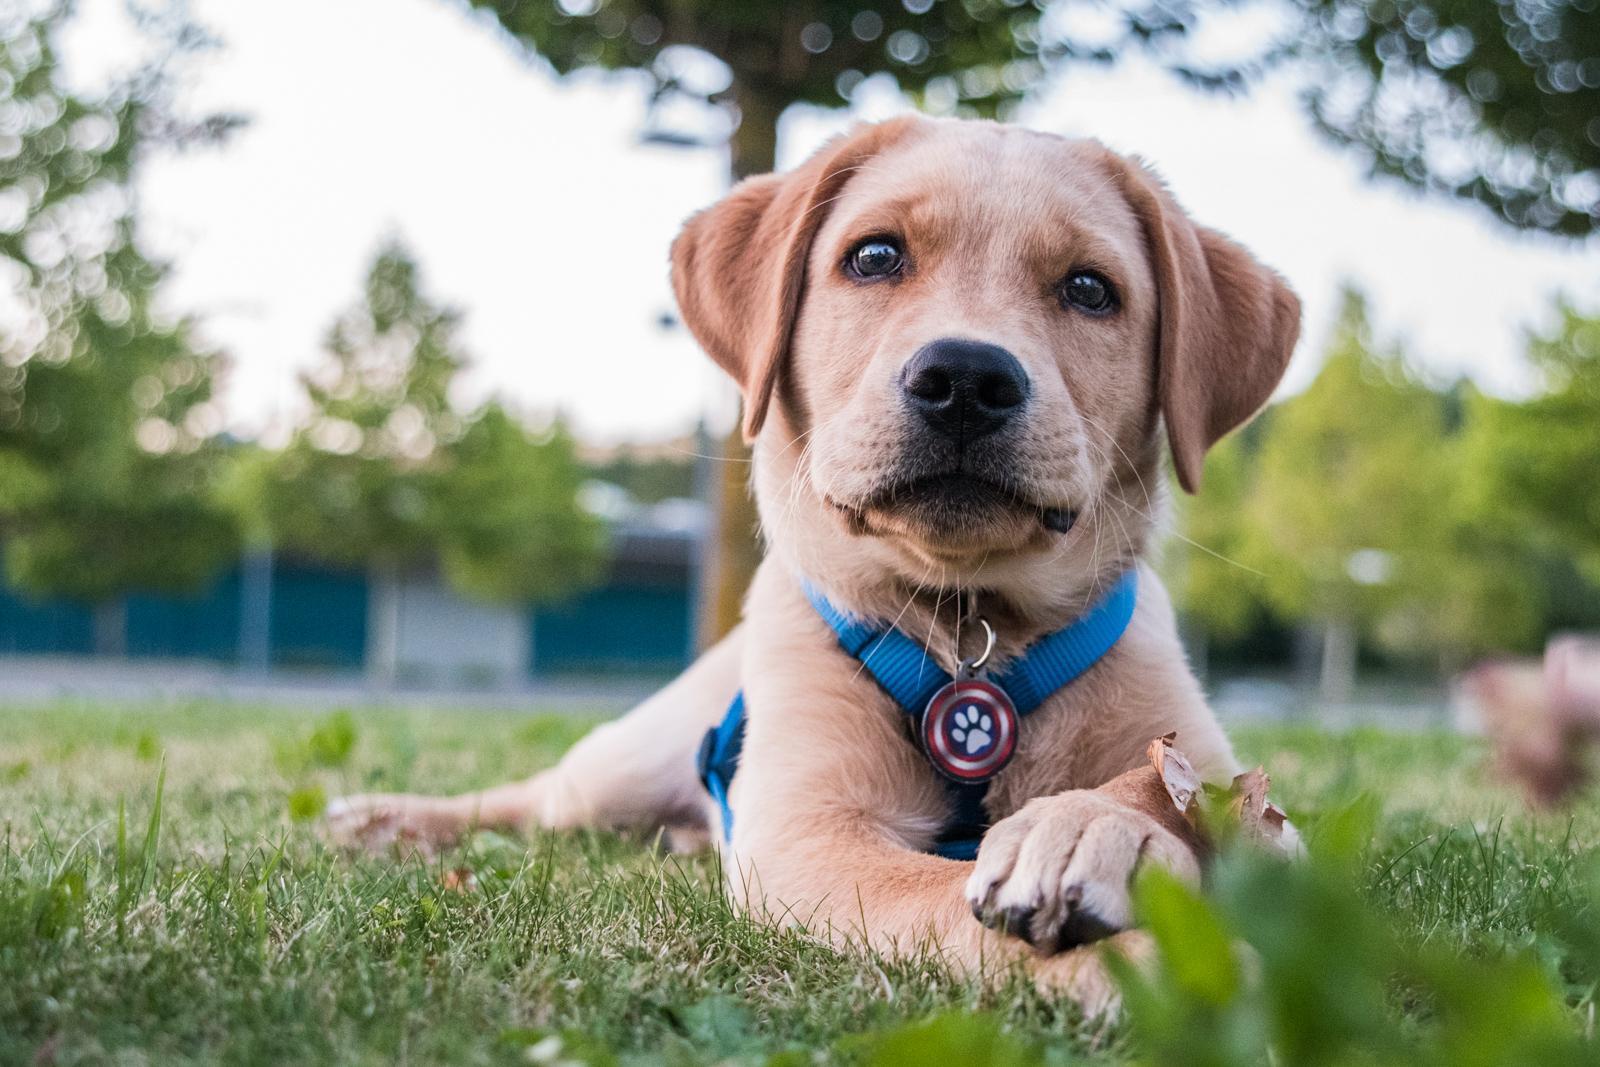 Tierfotograf-Labrador-Sven's Bildwerke-Hund-Hundefotografie15